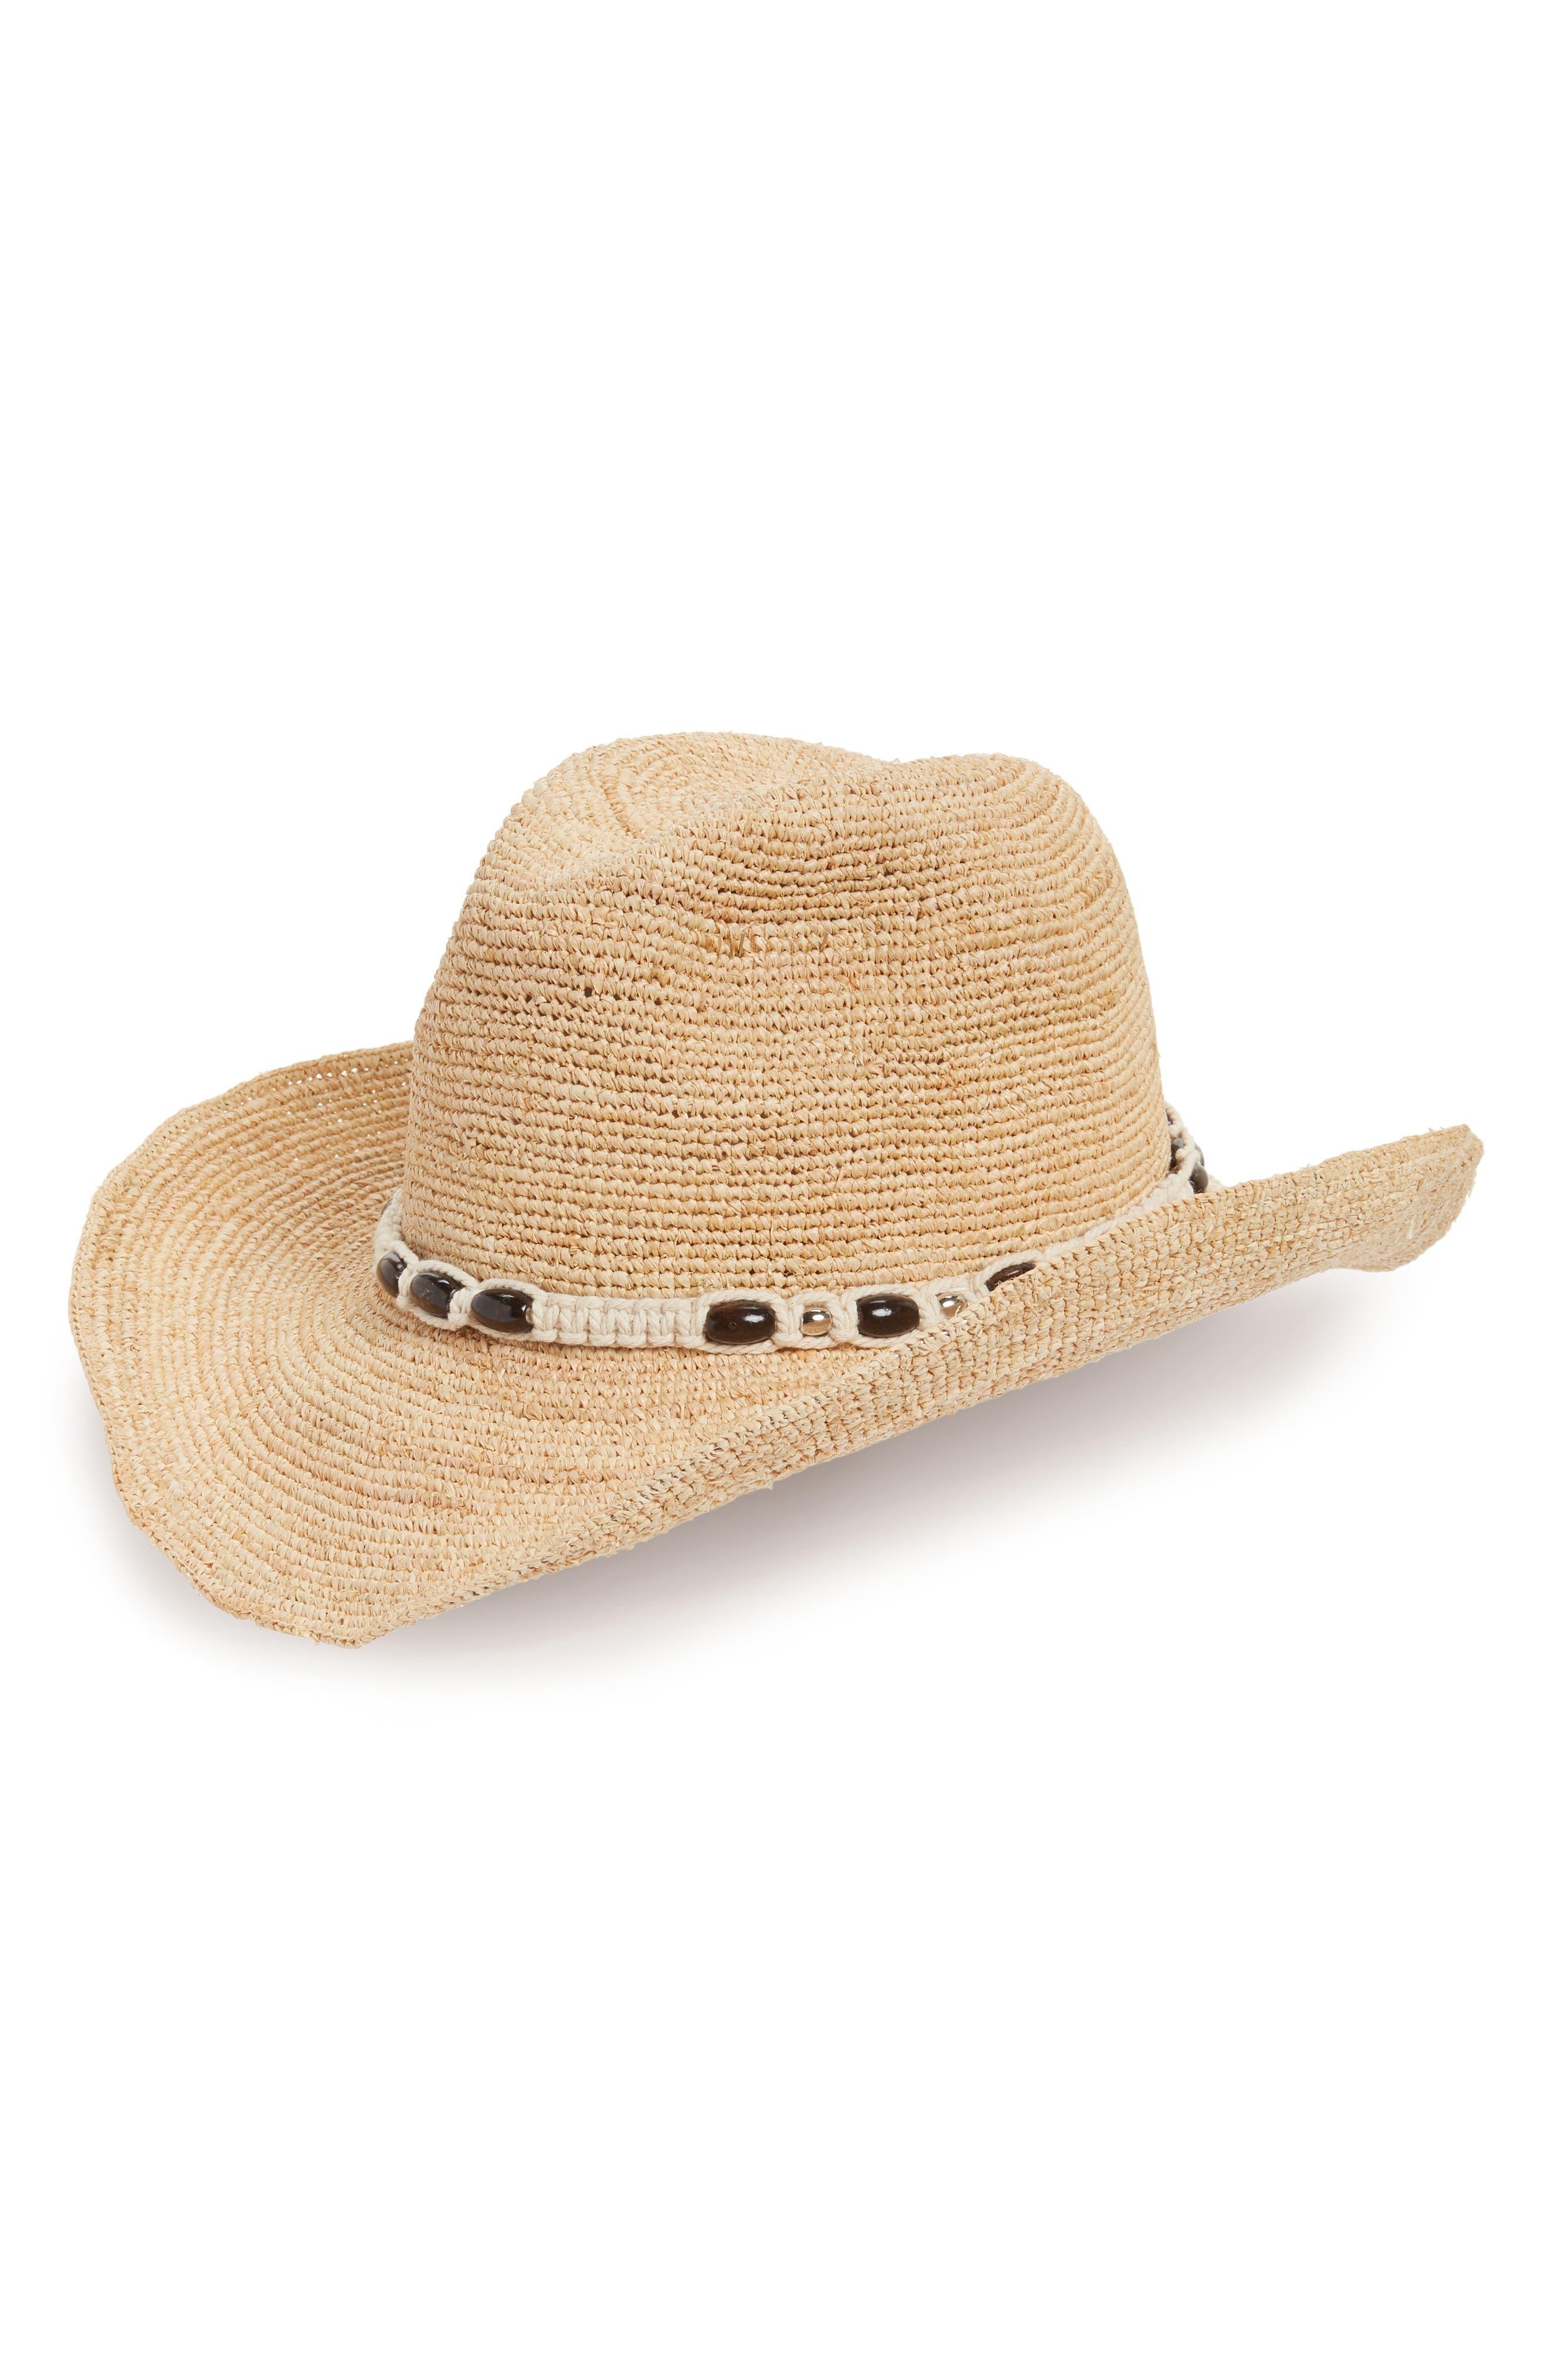 Raffia Cowboy Hat with Macramé Trim,                             Main thumbnail 1, color,                             Natural Combo